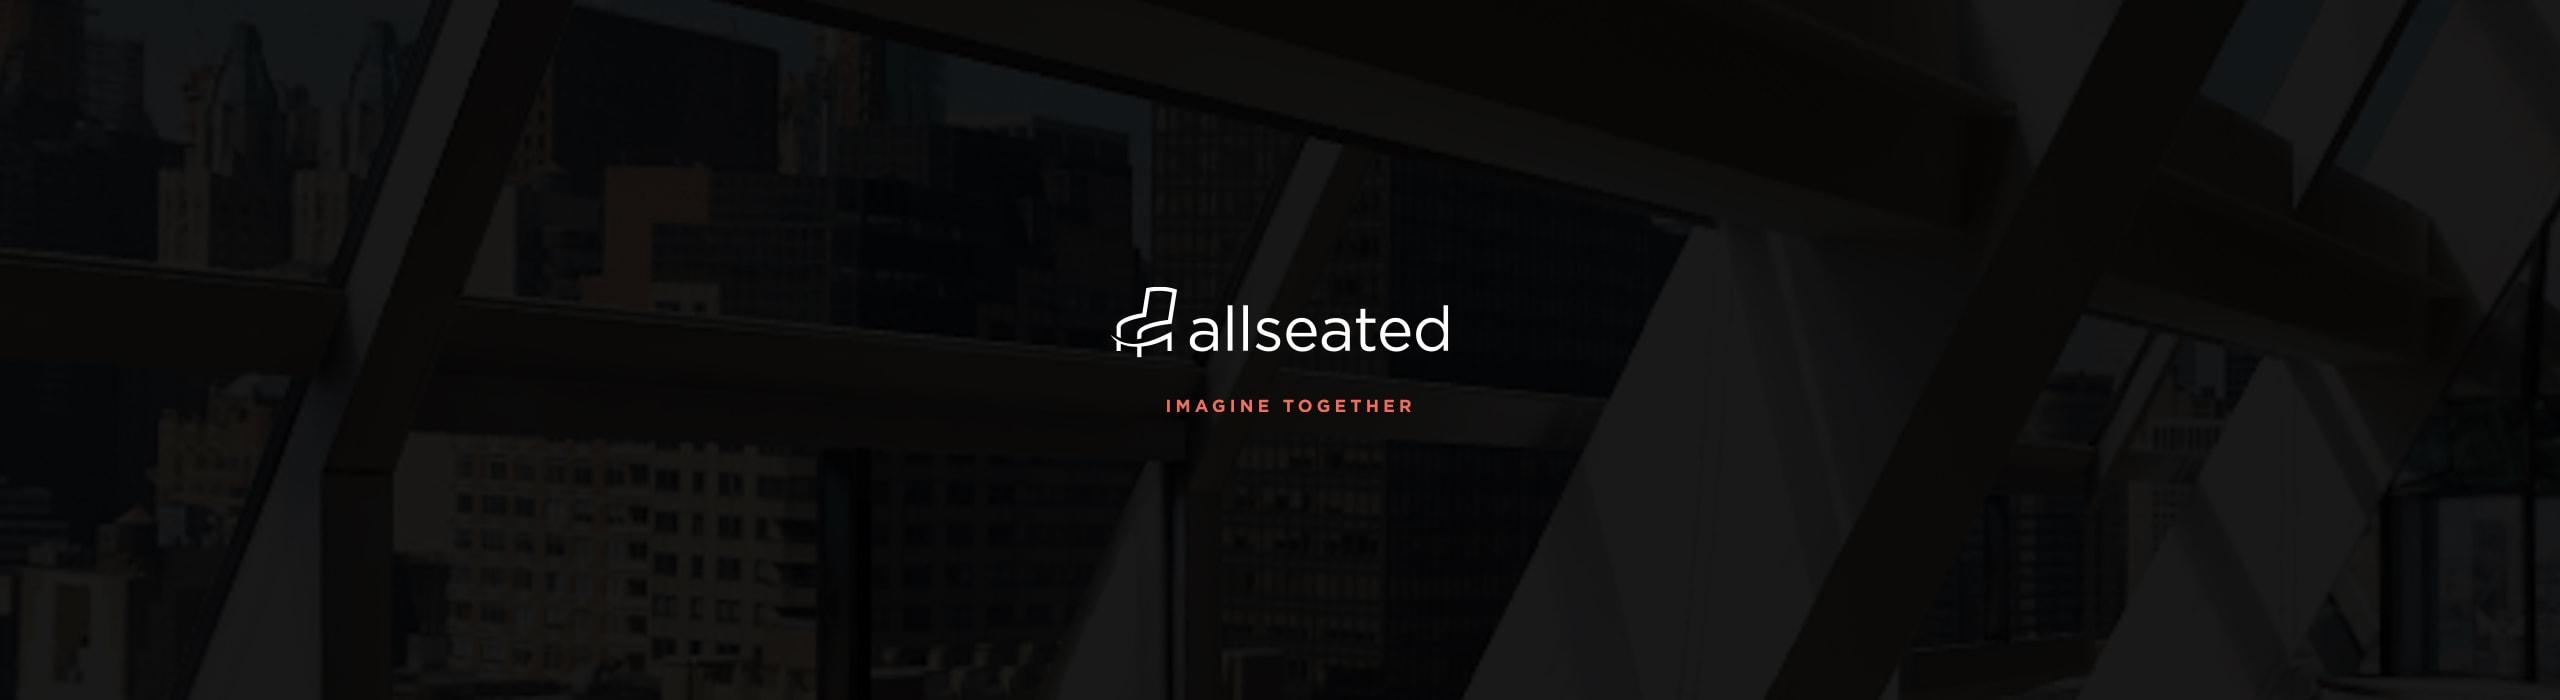 Allseated - AllSeated_1_eventplanning - Natie Branding Agency